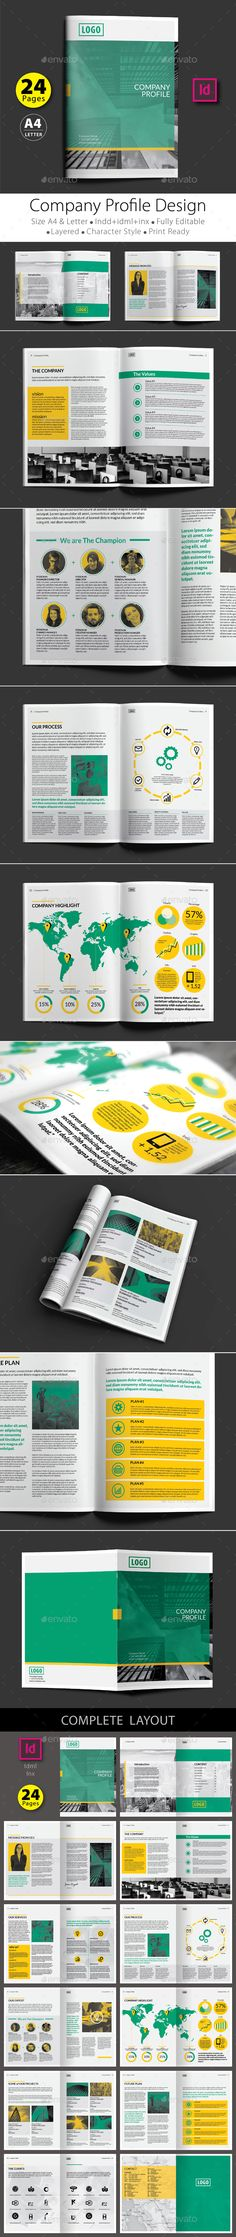 ... Company Profile Brochure Template InDesign INDD Company Profile   Professional  Business Profile Template ...  Professional Business Profile Template